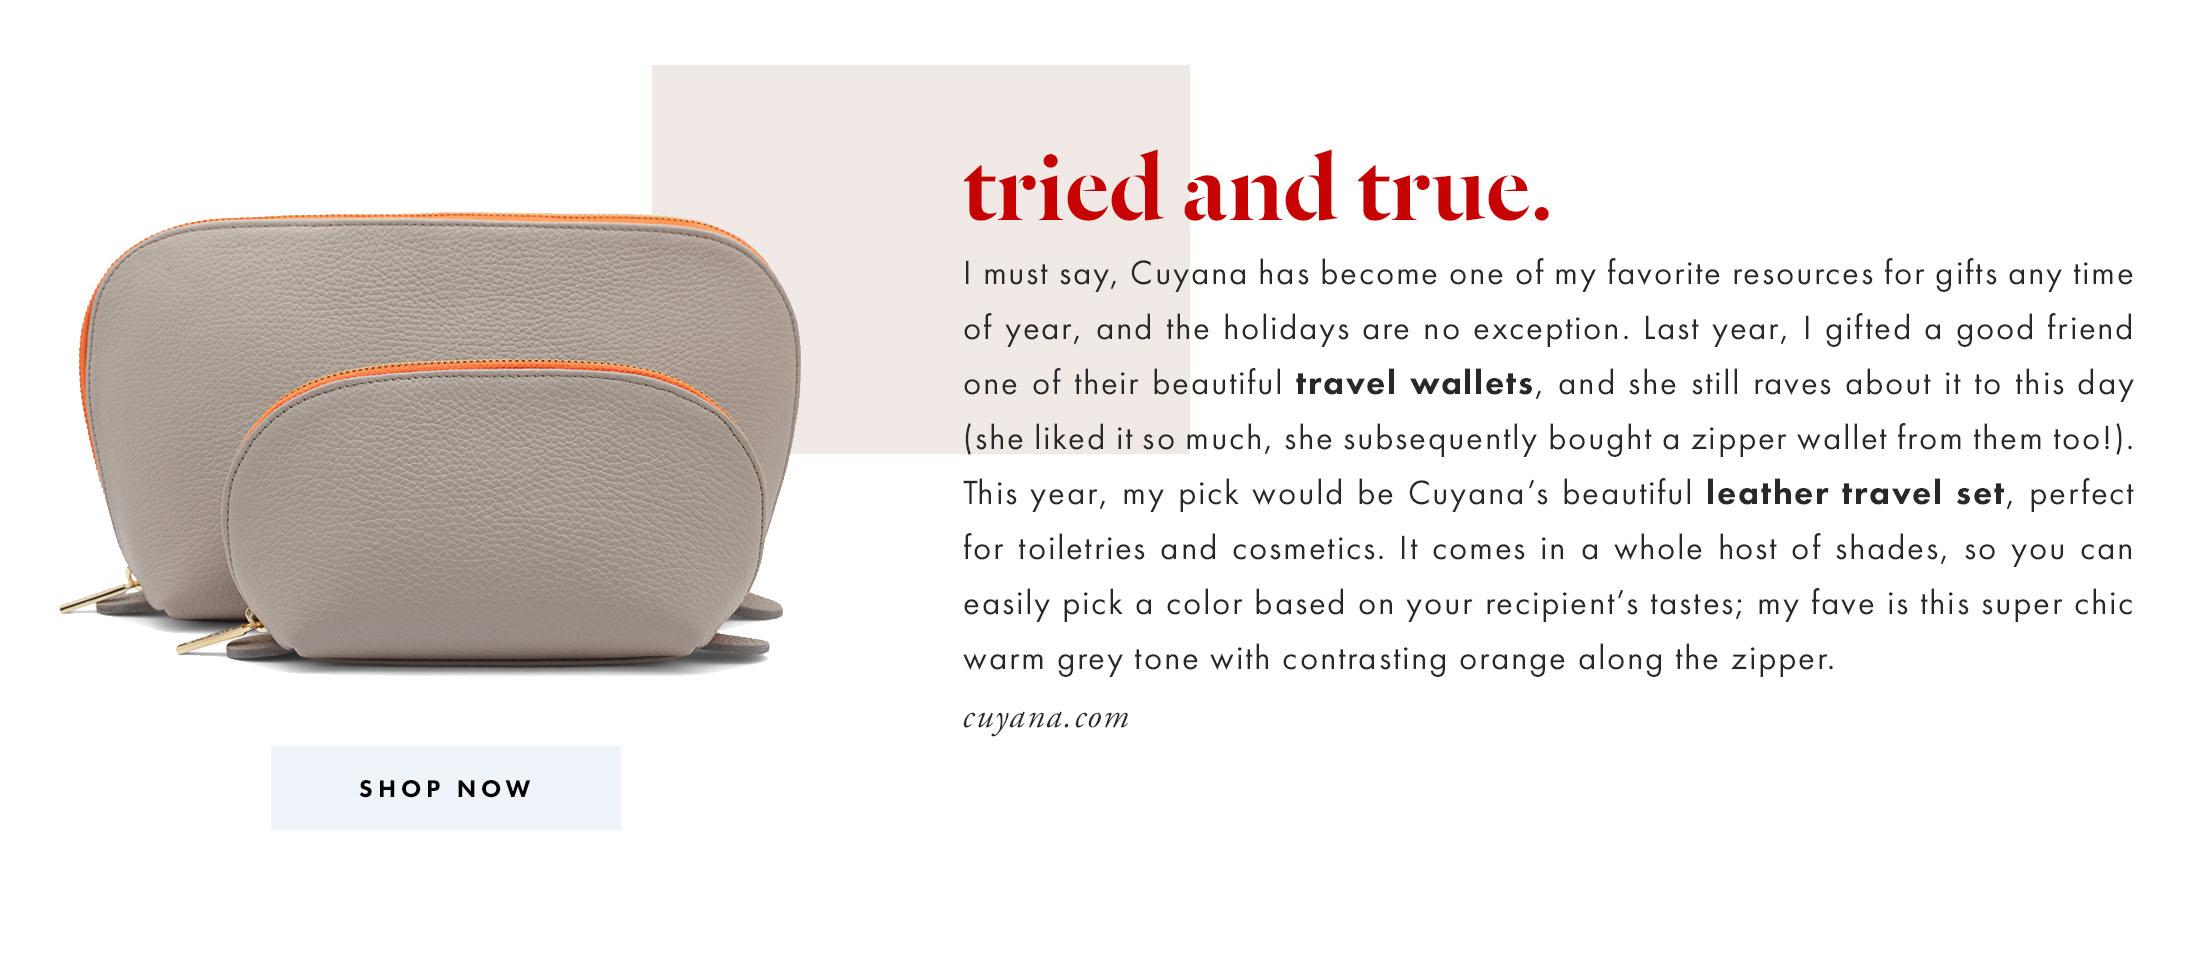 cuyana-travel-set-great-gift-idea